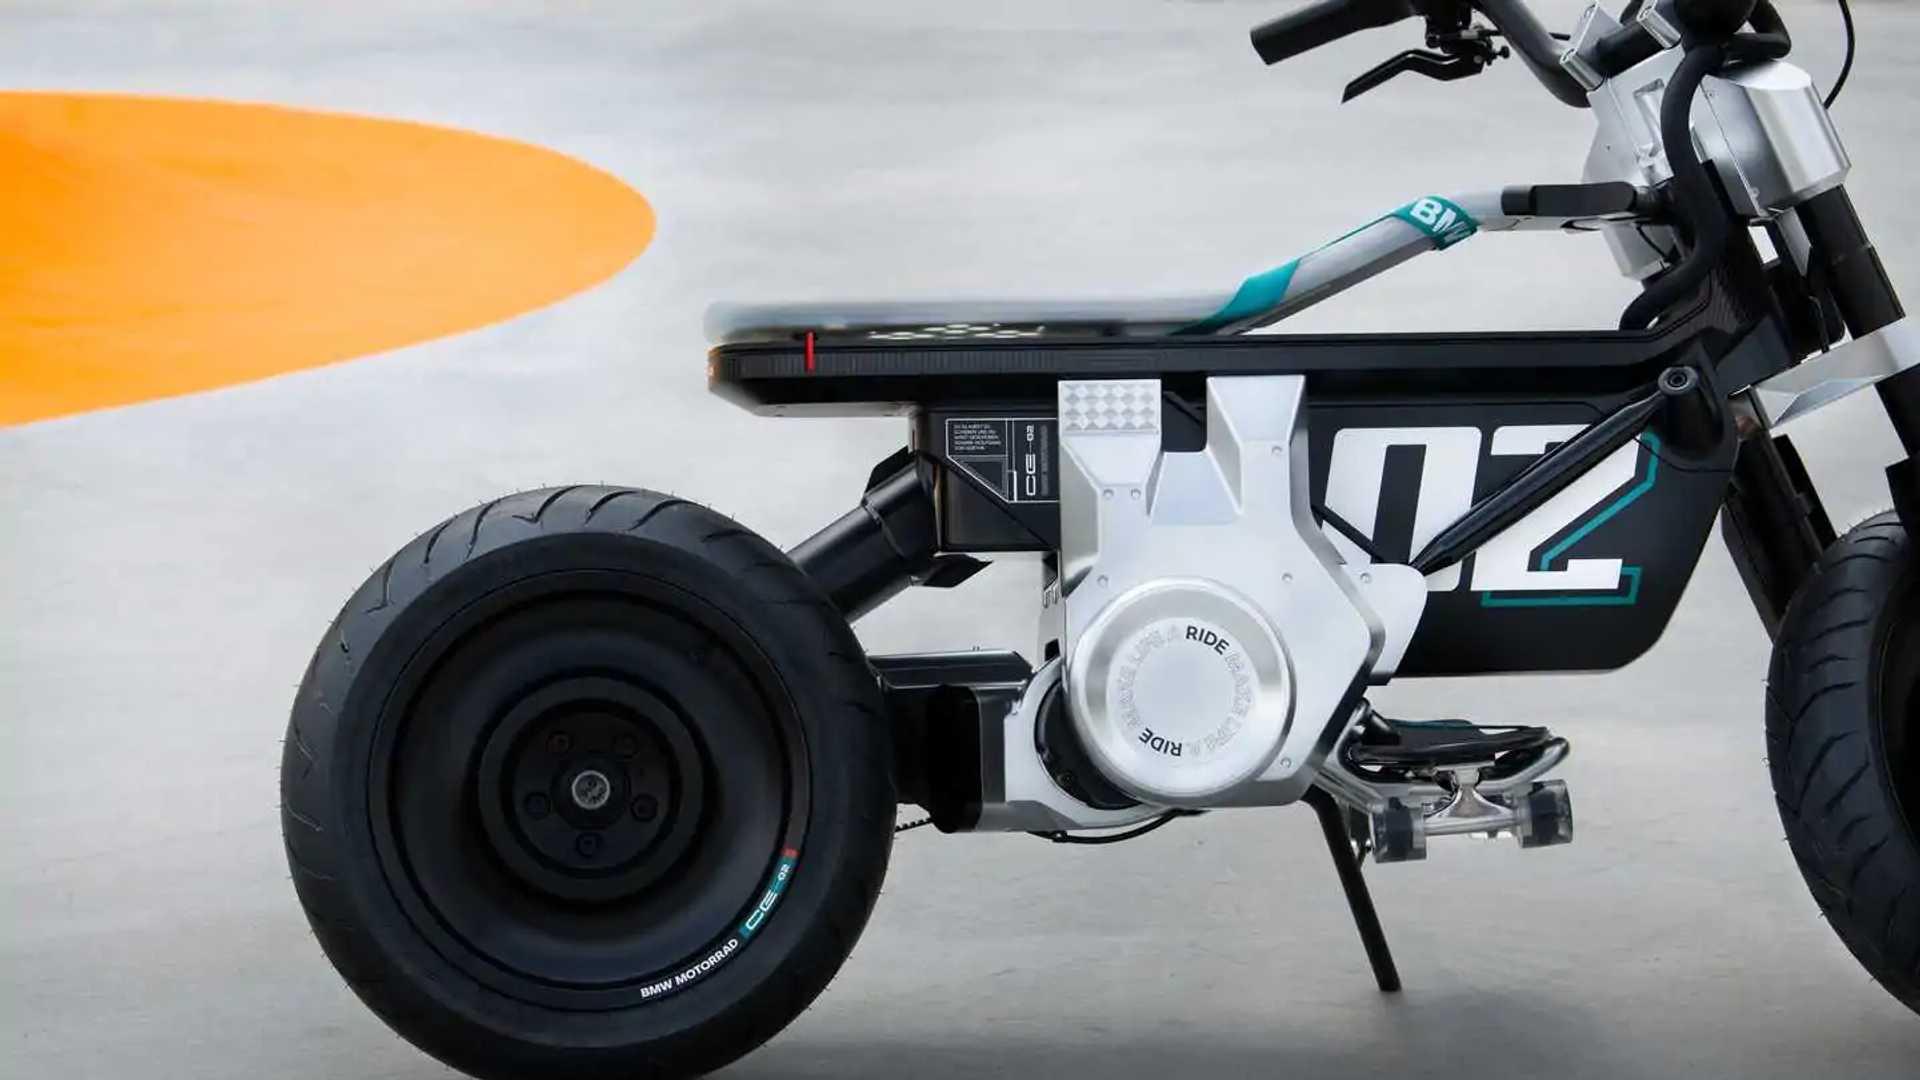 BMW Motorrad Concept CE 02 - Rear Right Side Closeup